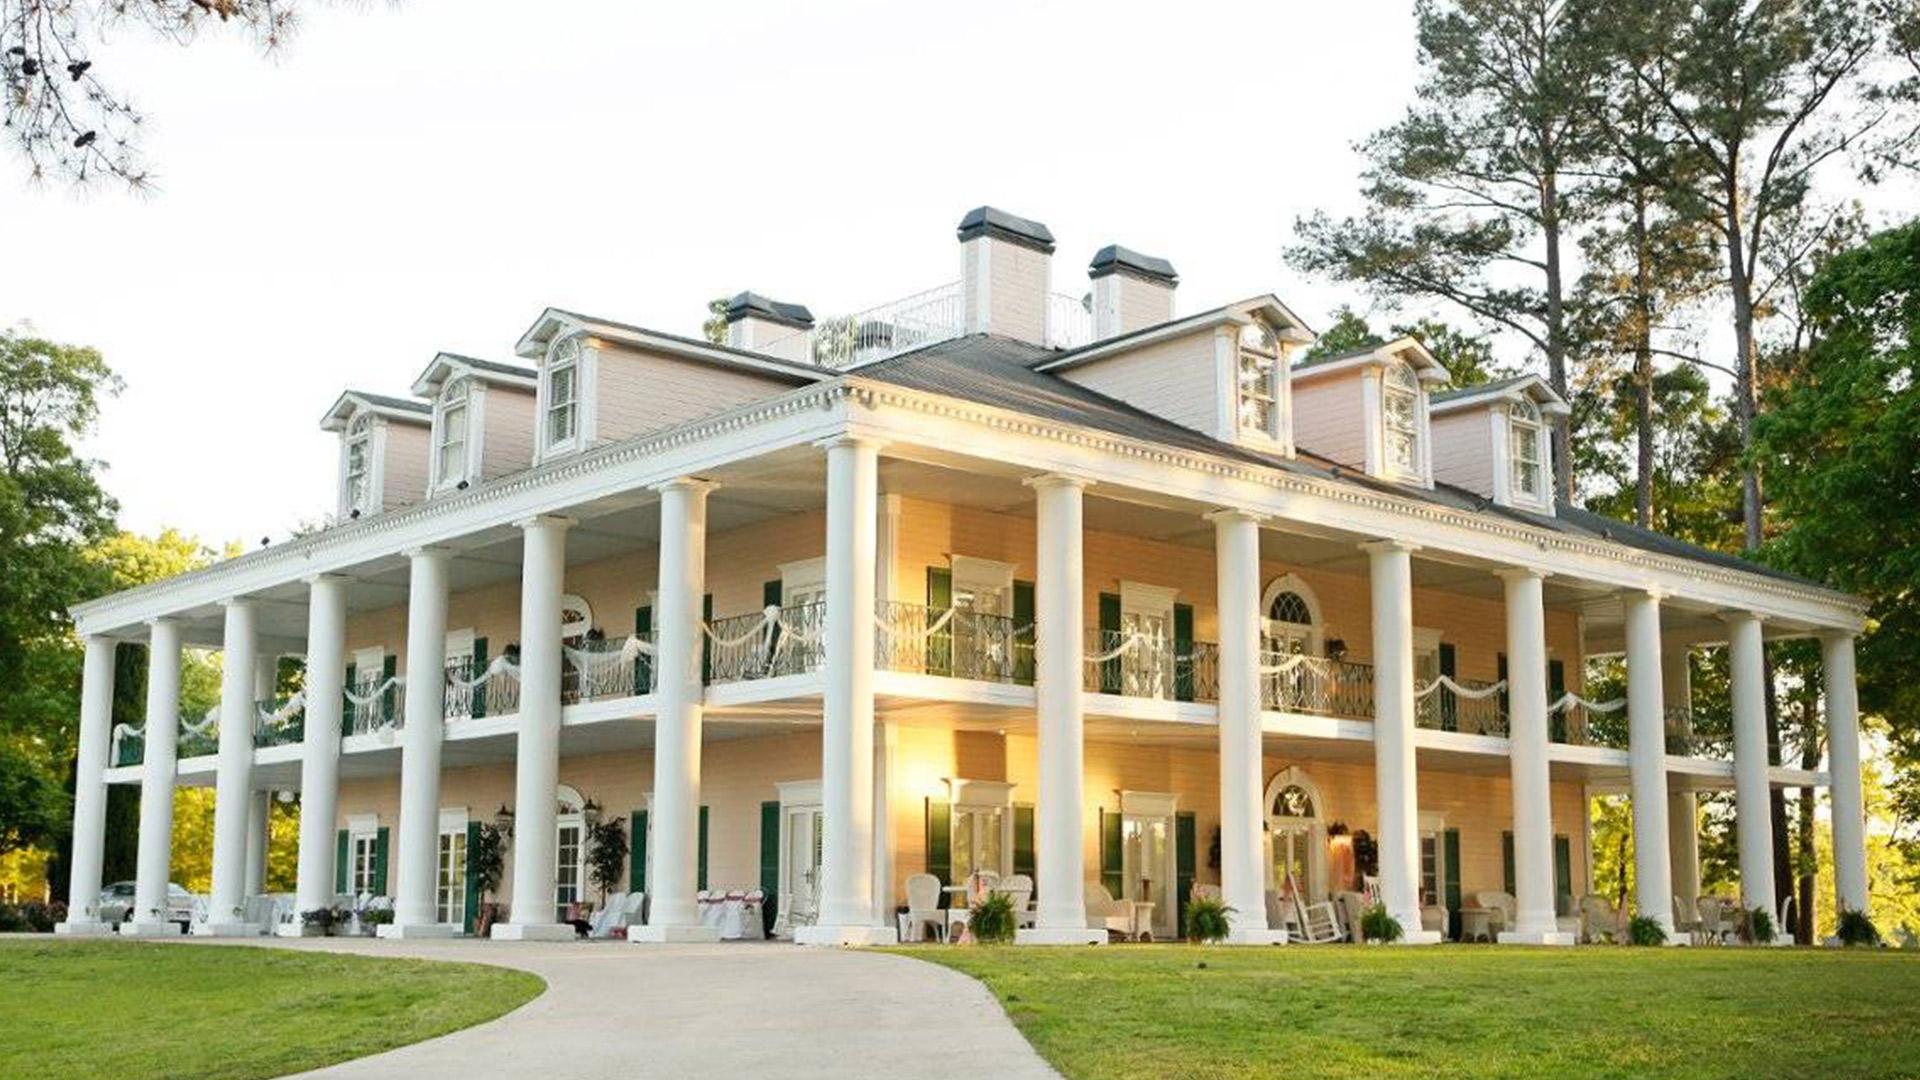 Petite Weddings at Birmingham Antebellum Wedding Venue - Oak Island Mansion in Wilsonville